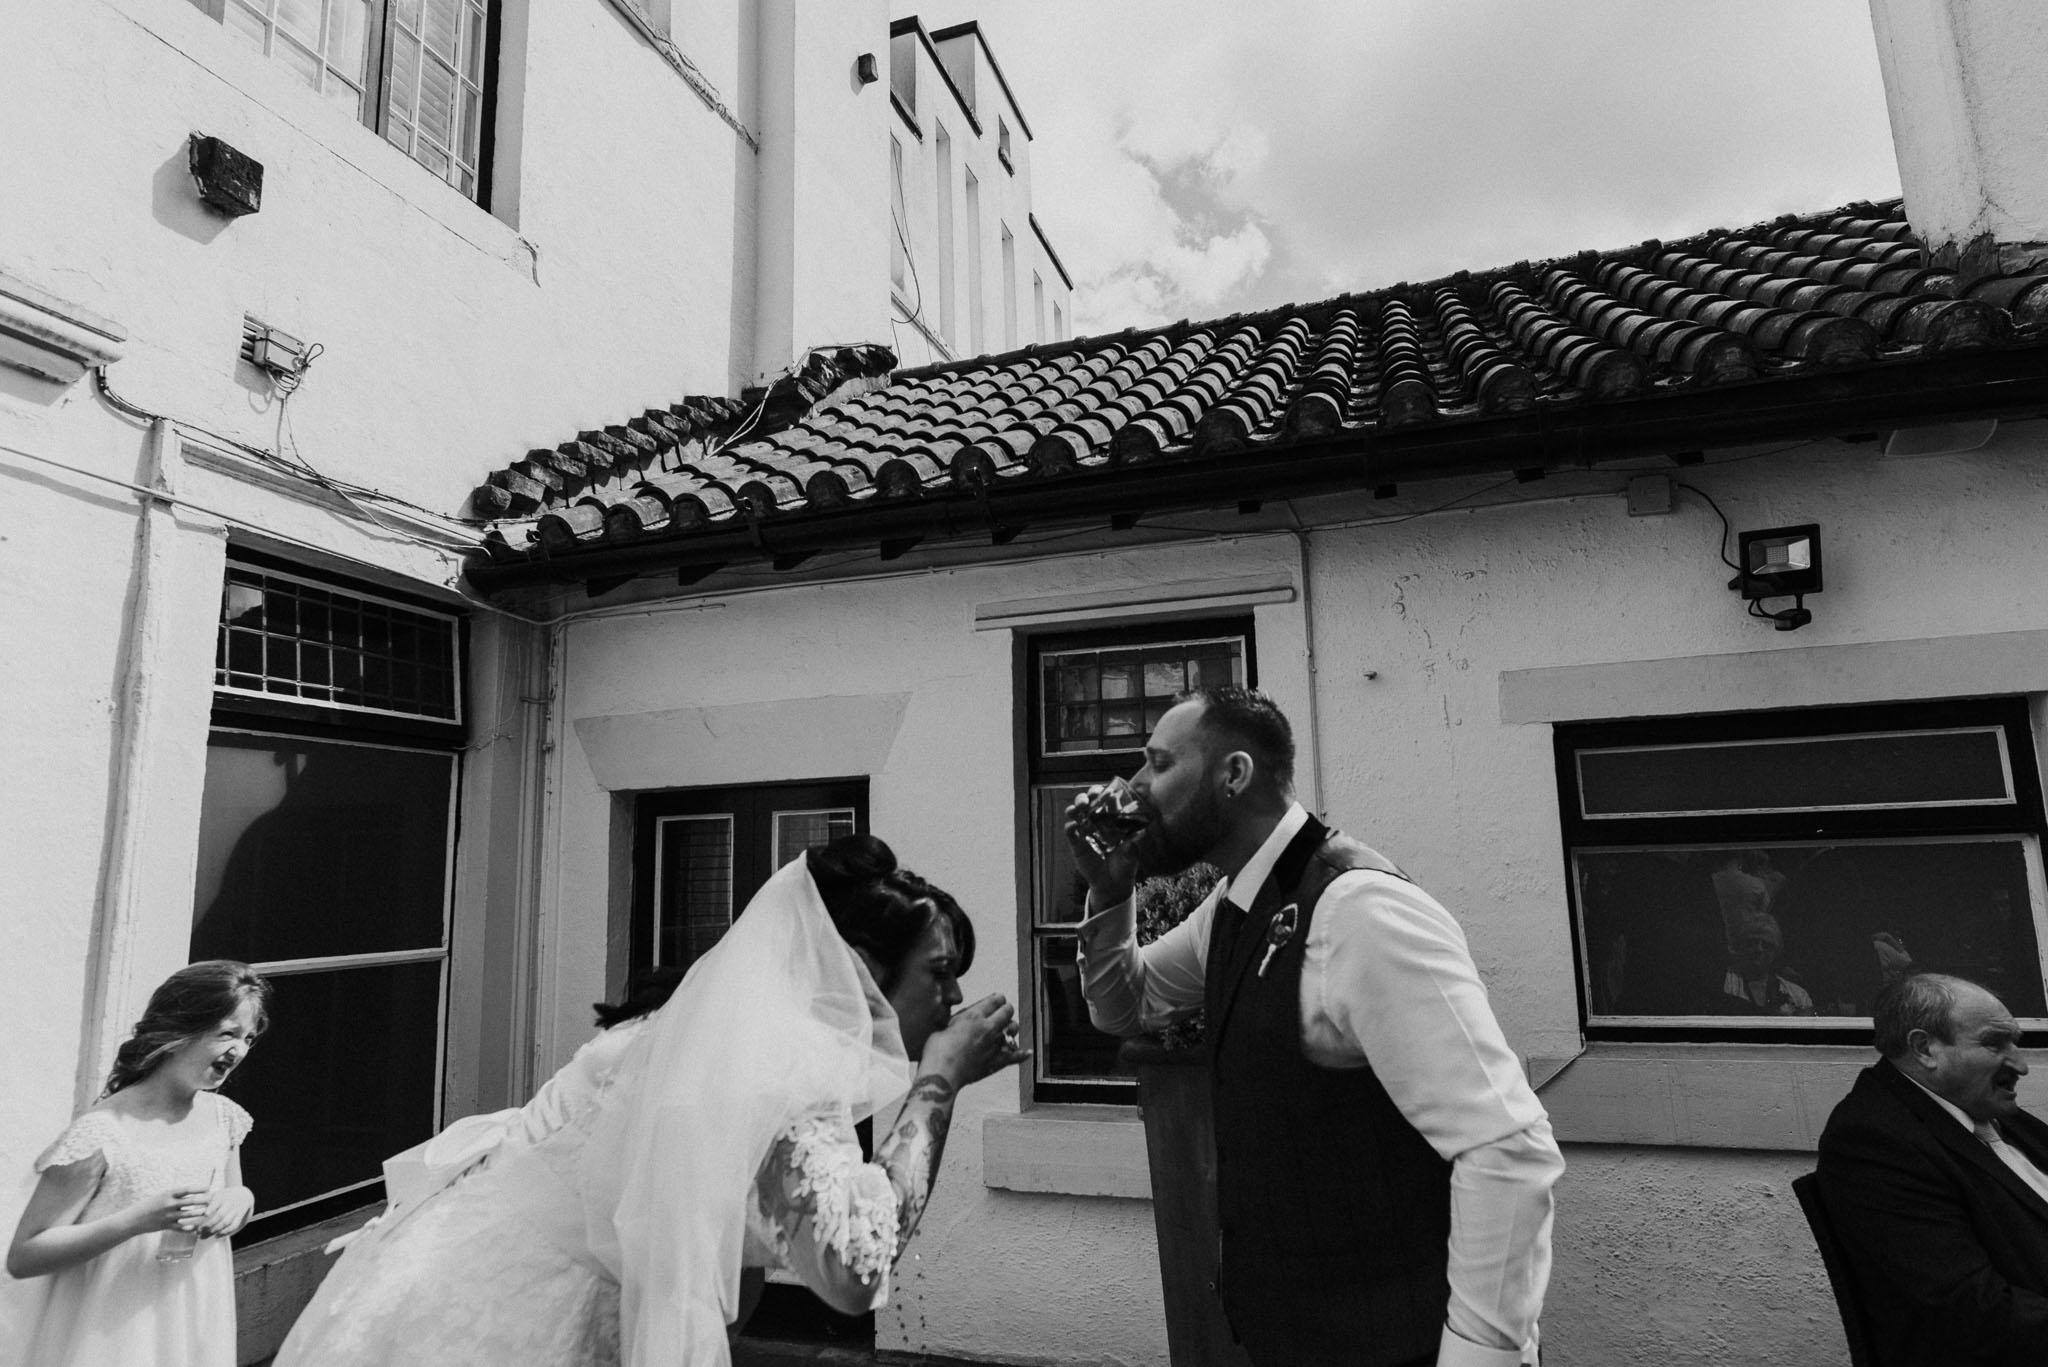 fun-wedding-photography-at-the-belle-epoque-knutsford-wedding-photographer (3).jpg